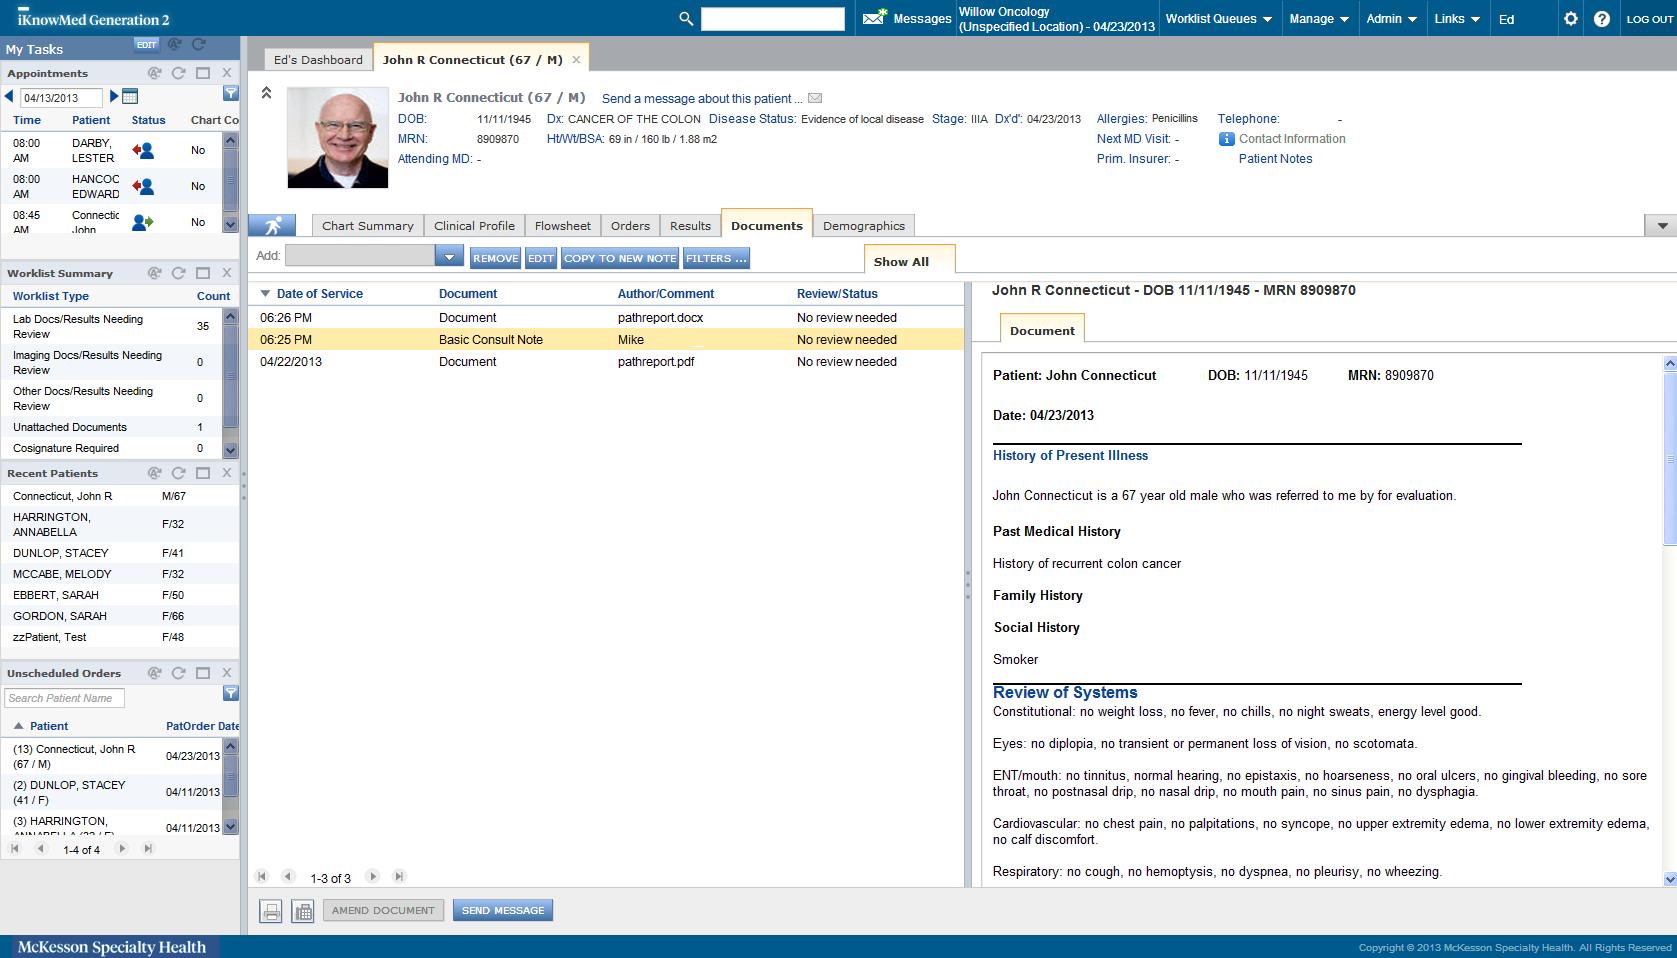 Personalized documentation options